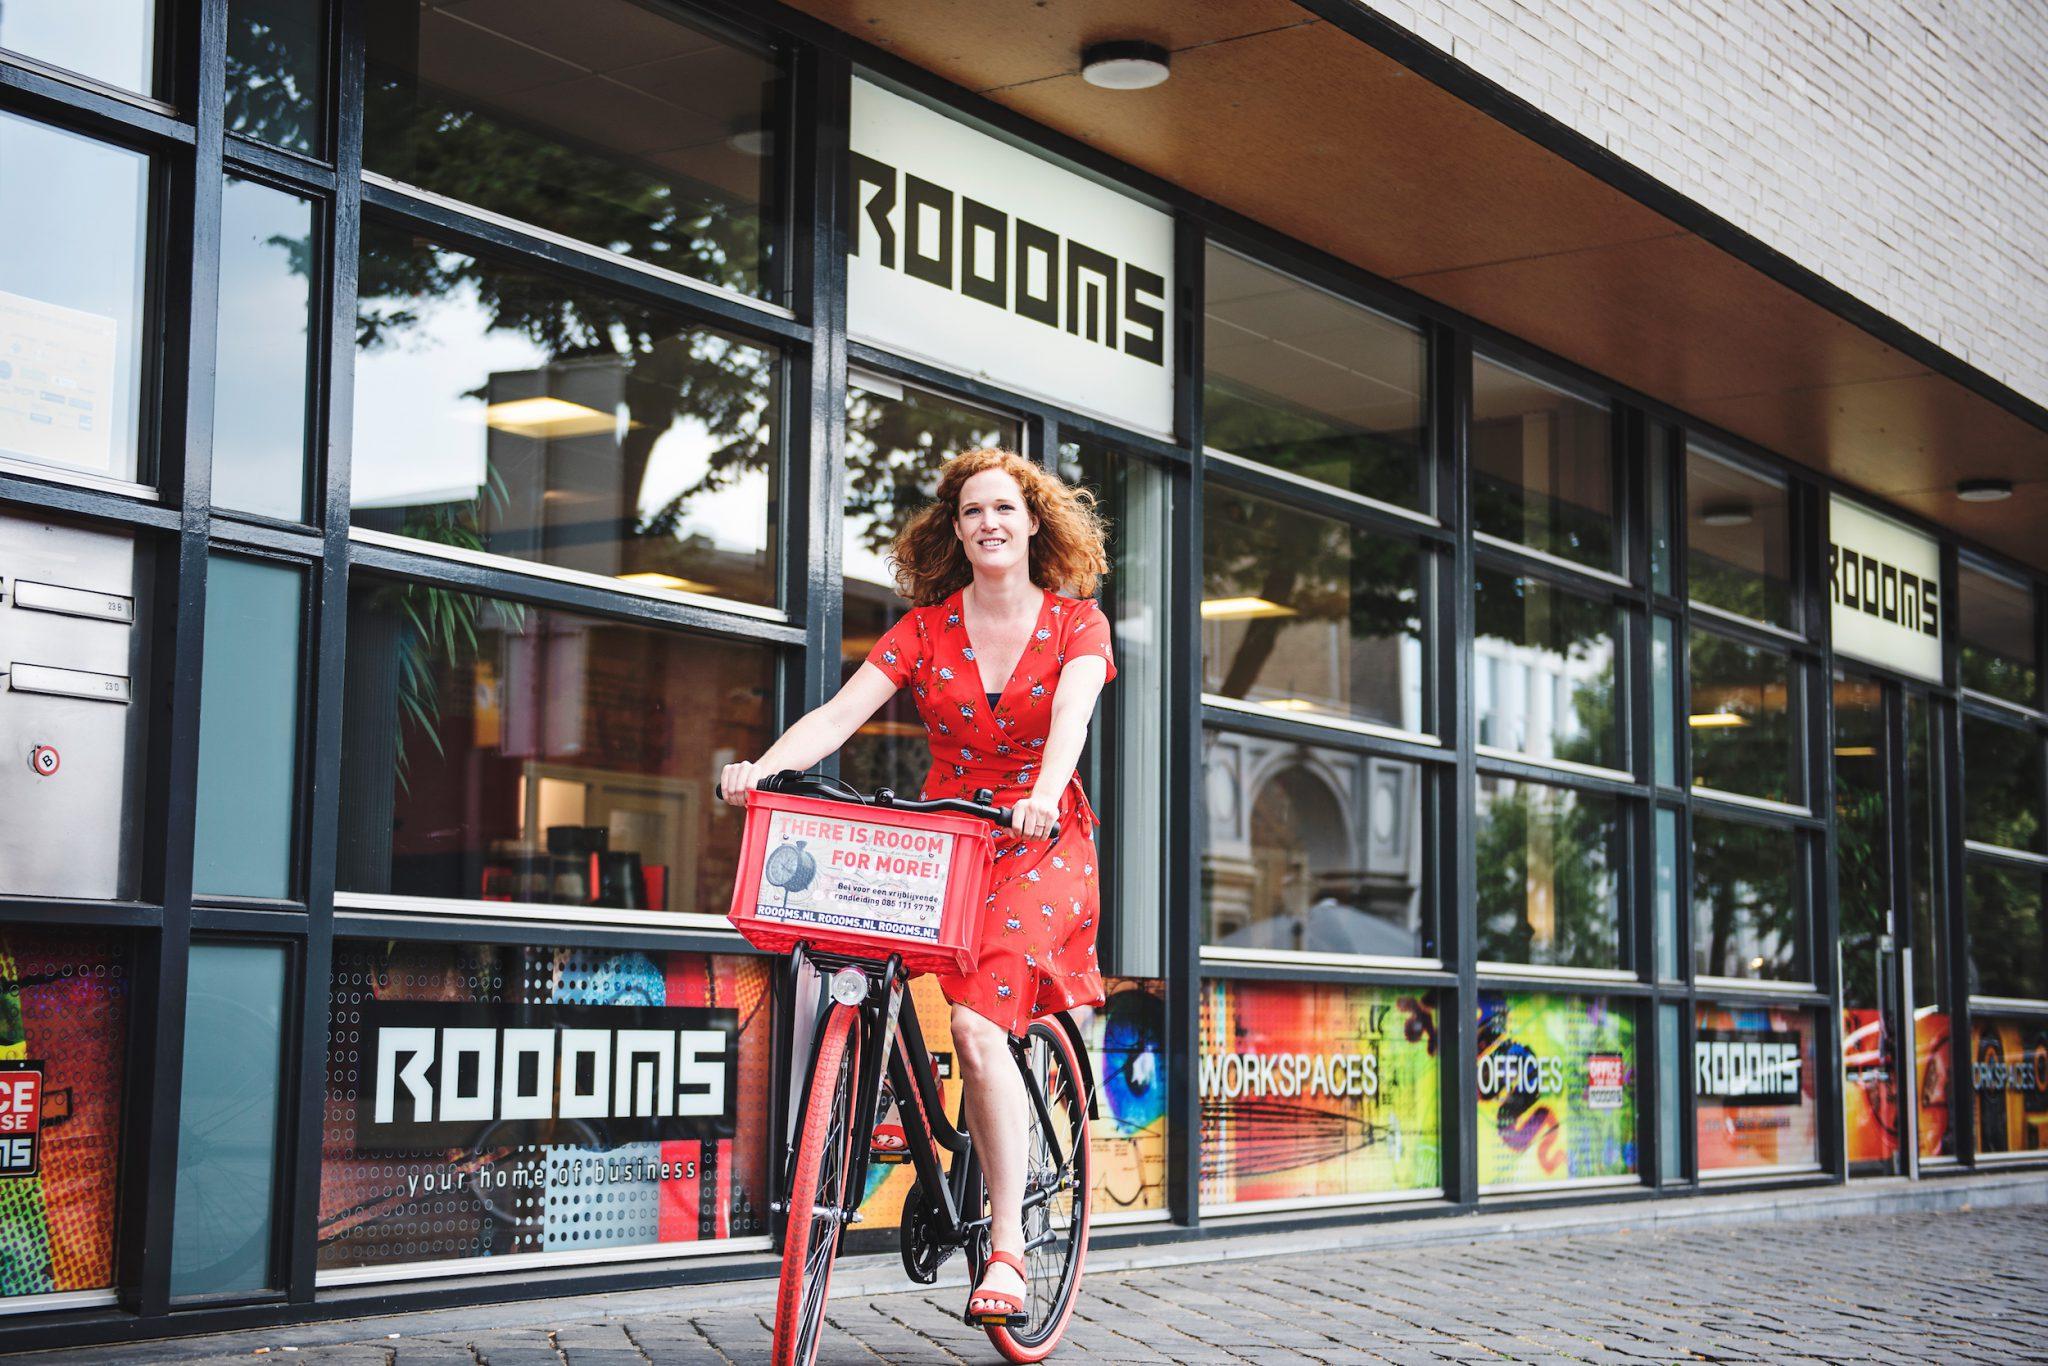 ROOOMS Maastricht